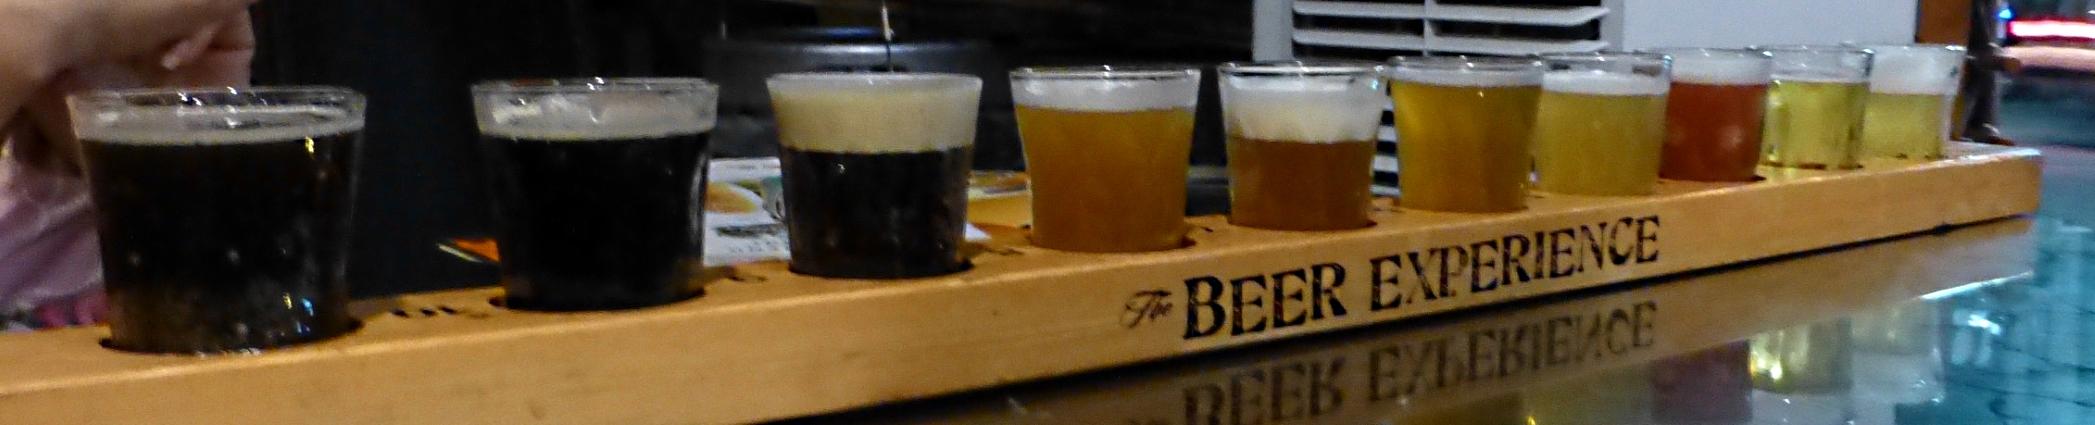 Beer Republic, Chiang Mai, Bier in Thailand, Bier vor Ort, Bierreisen, Craft Beer, Bierbar, Pub